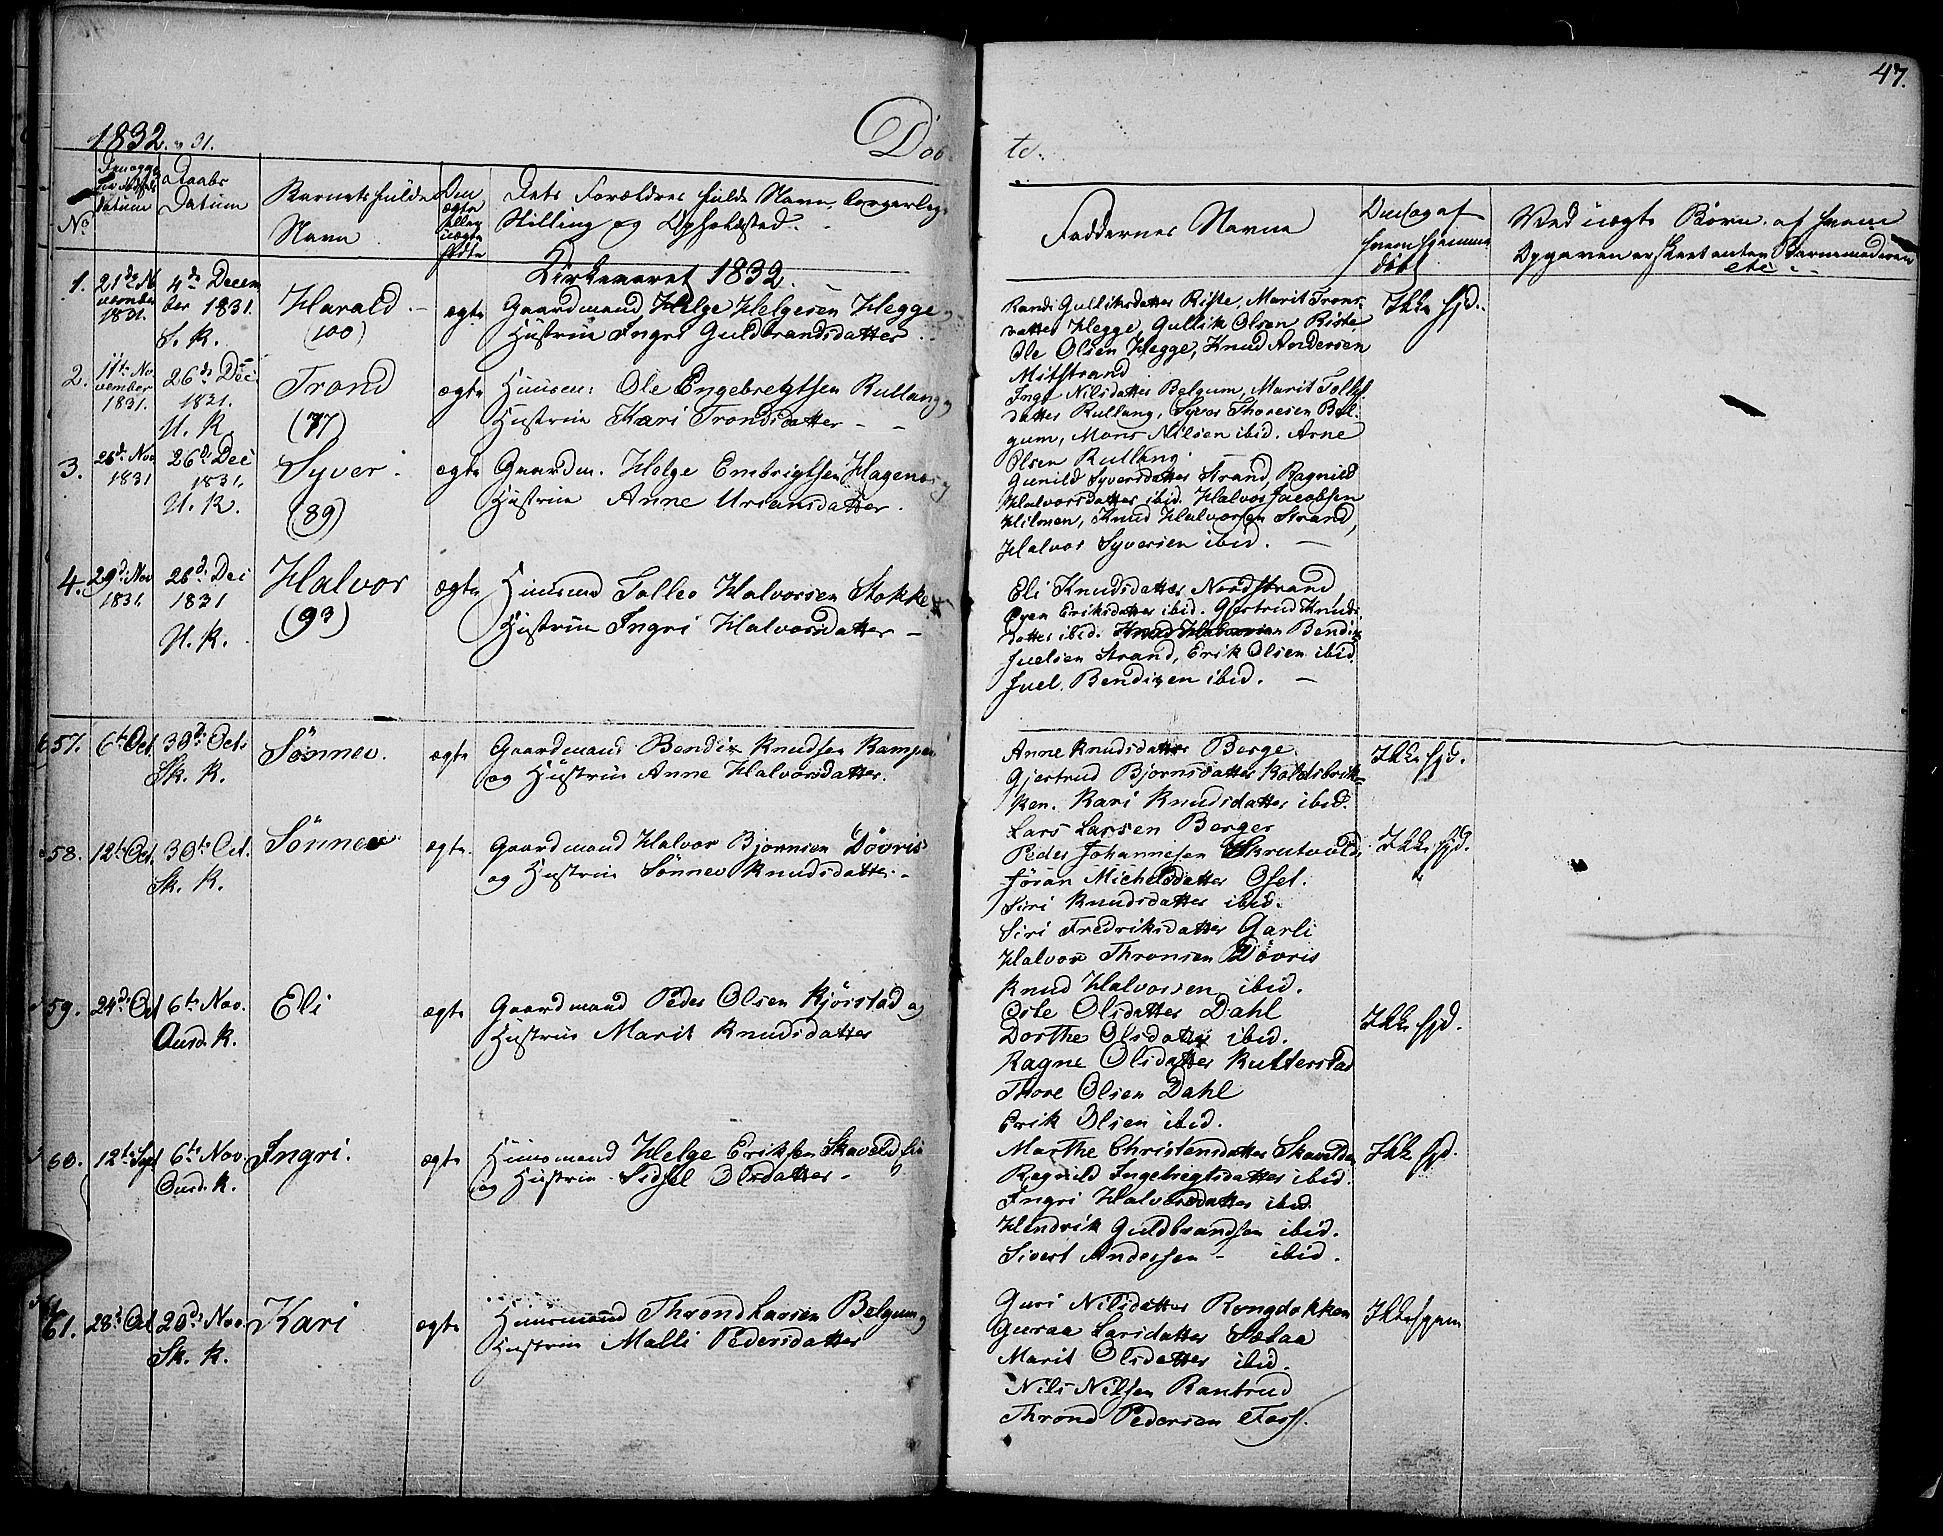 SAH, Nord-Aurdal prestekontor, Ministerialbok nr. 3, 1828-1841, s. 47